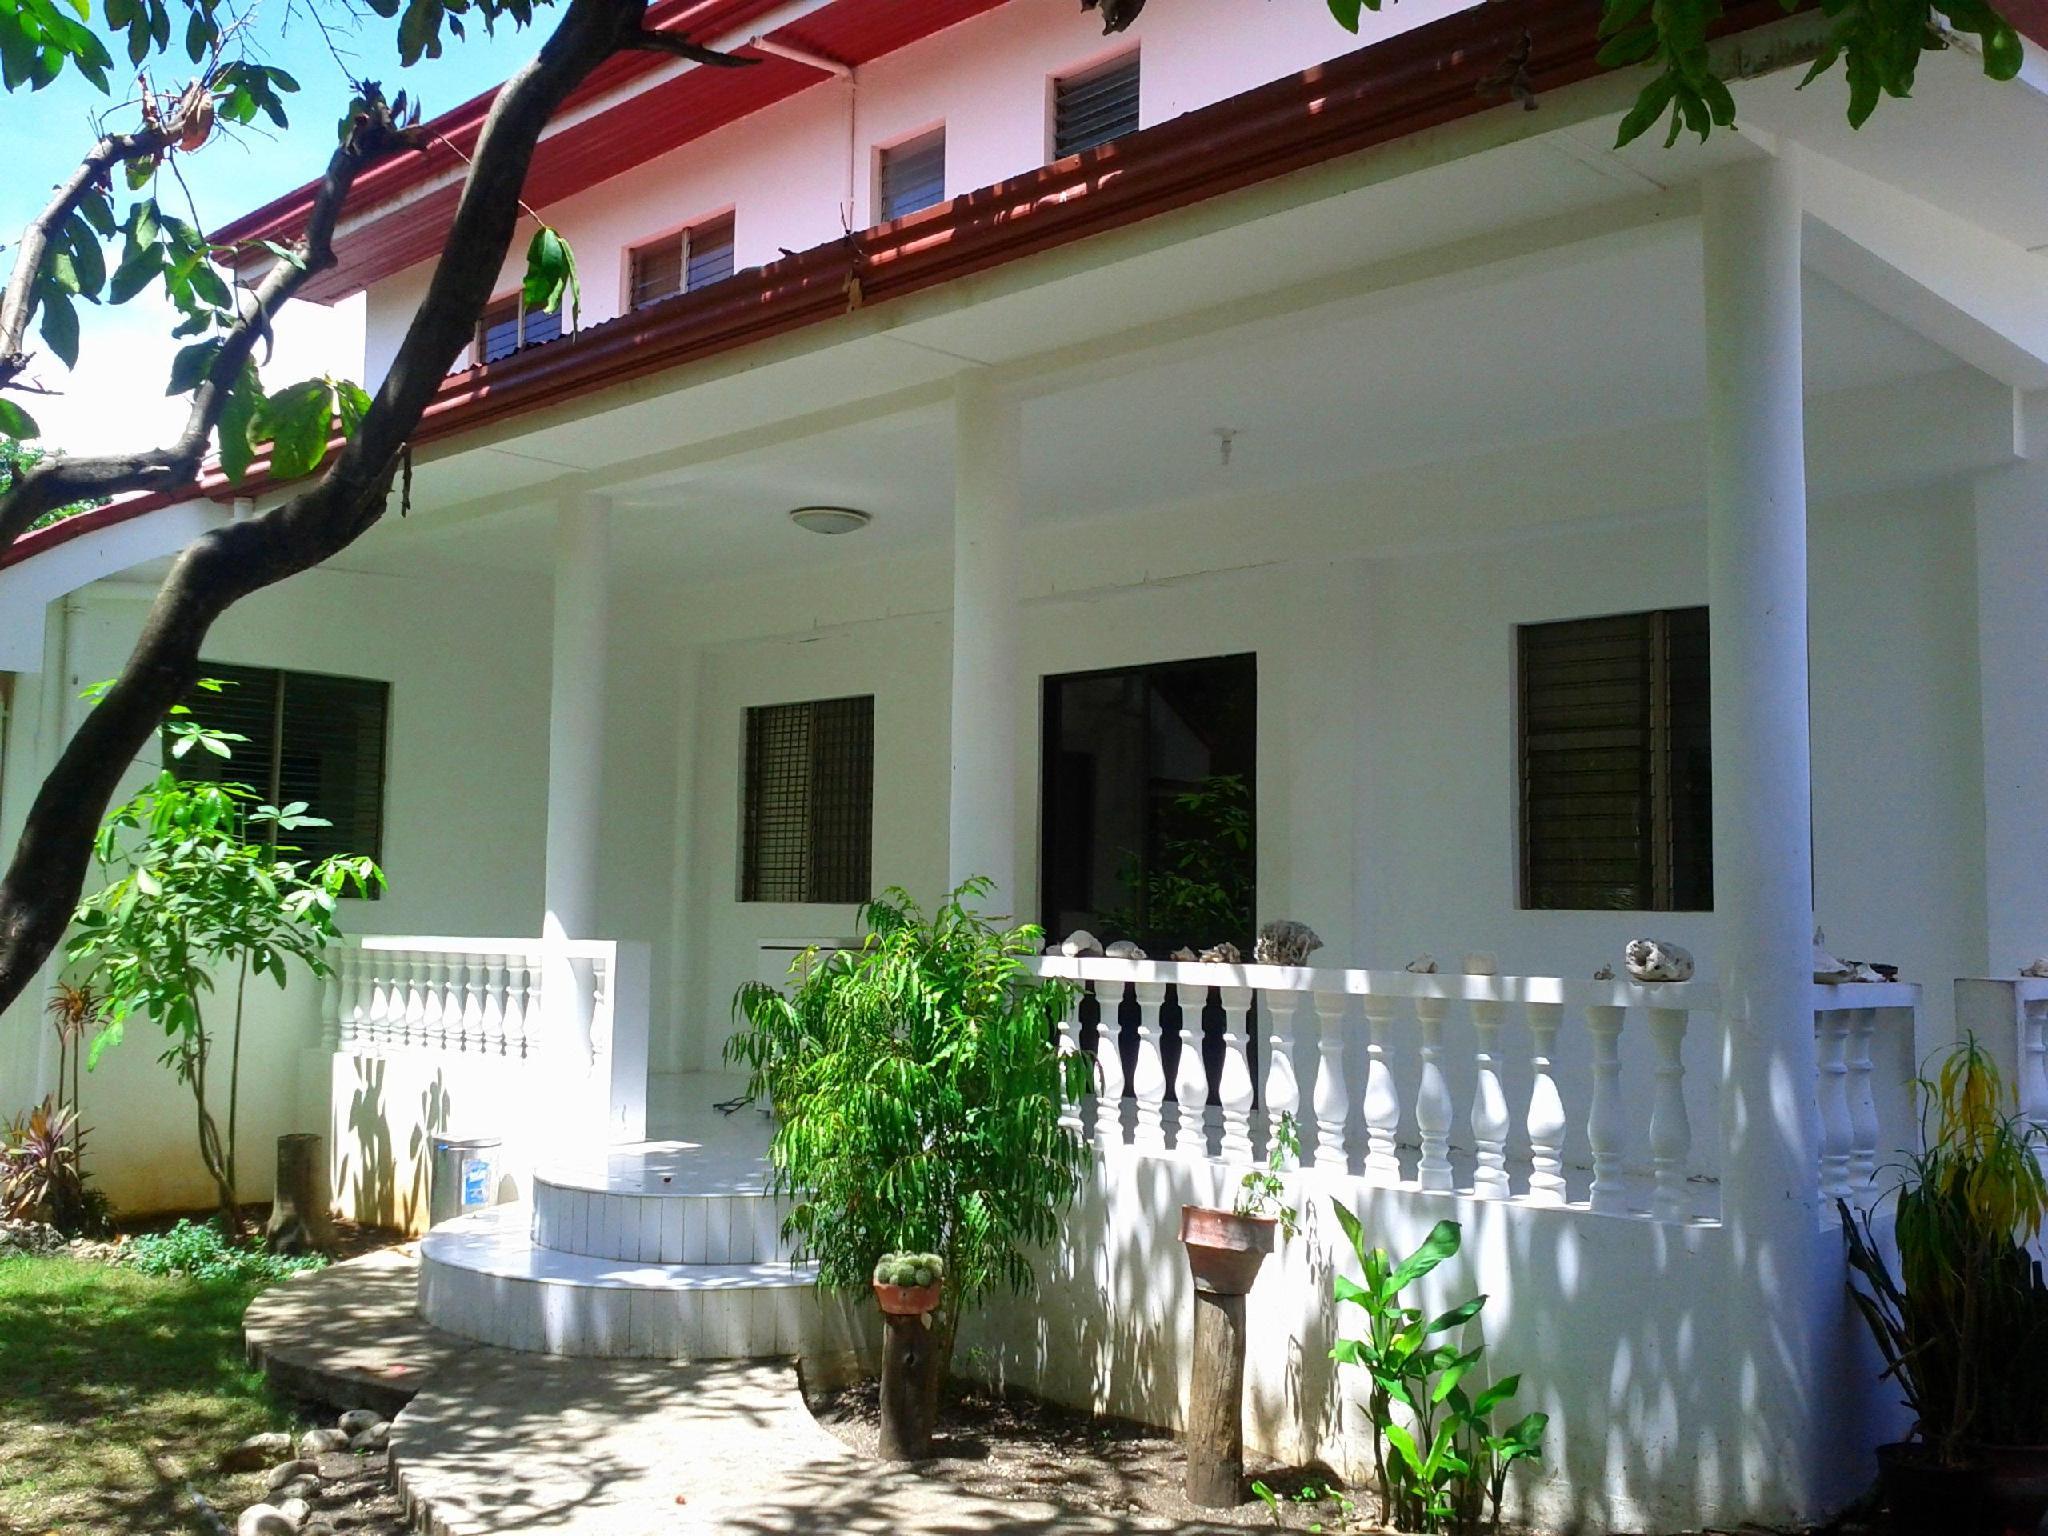 Luzmin BH - White House